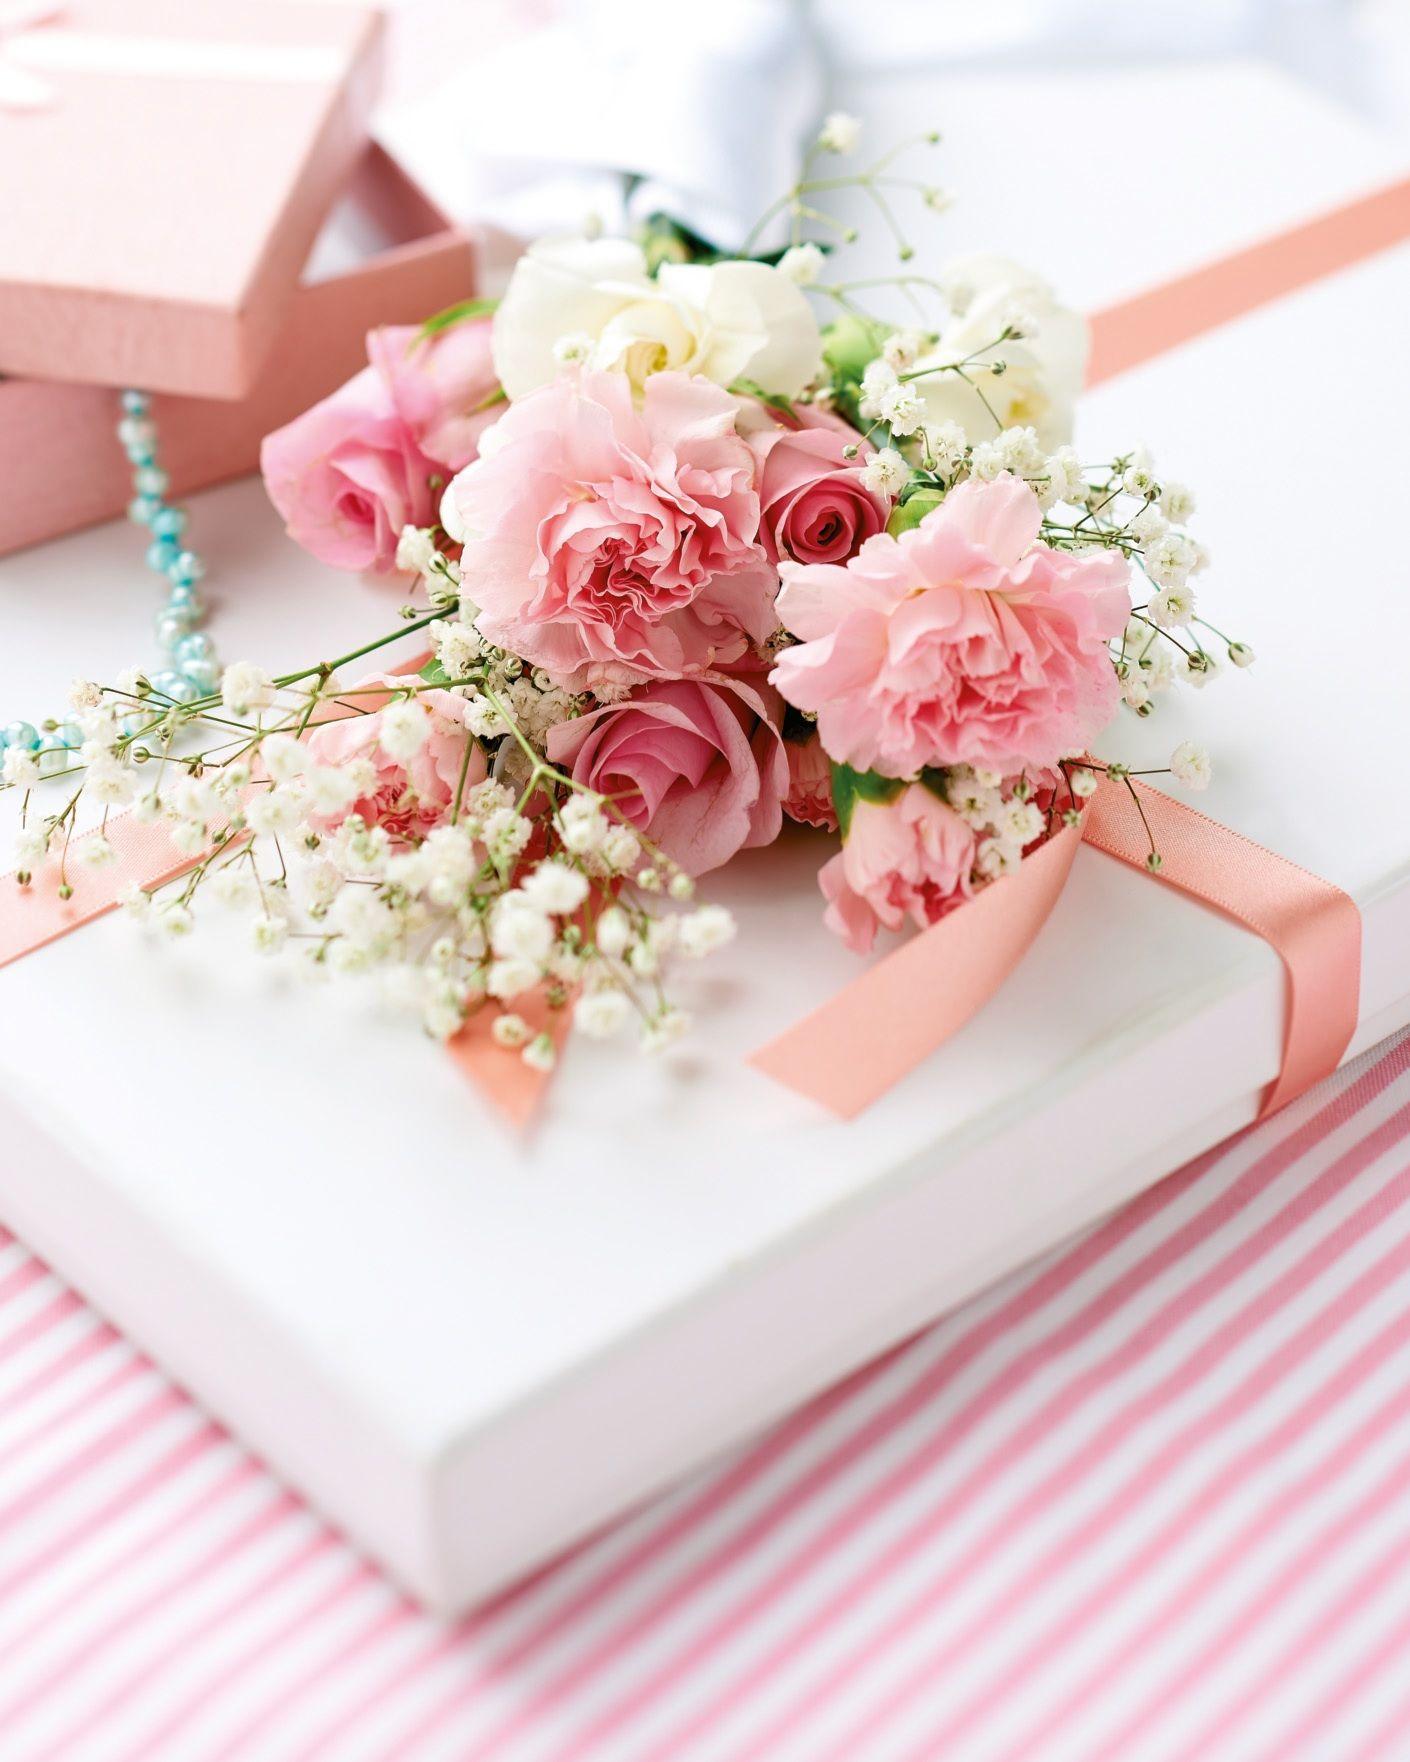 Envolver regalos bonitos Flower bouquets Gift flowers and Wraps